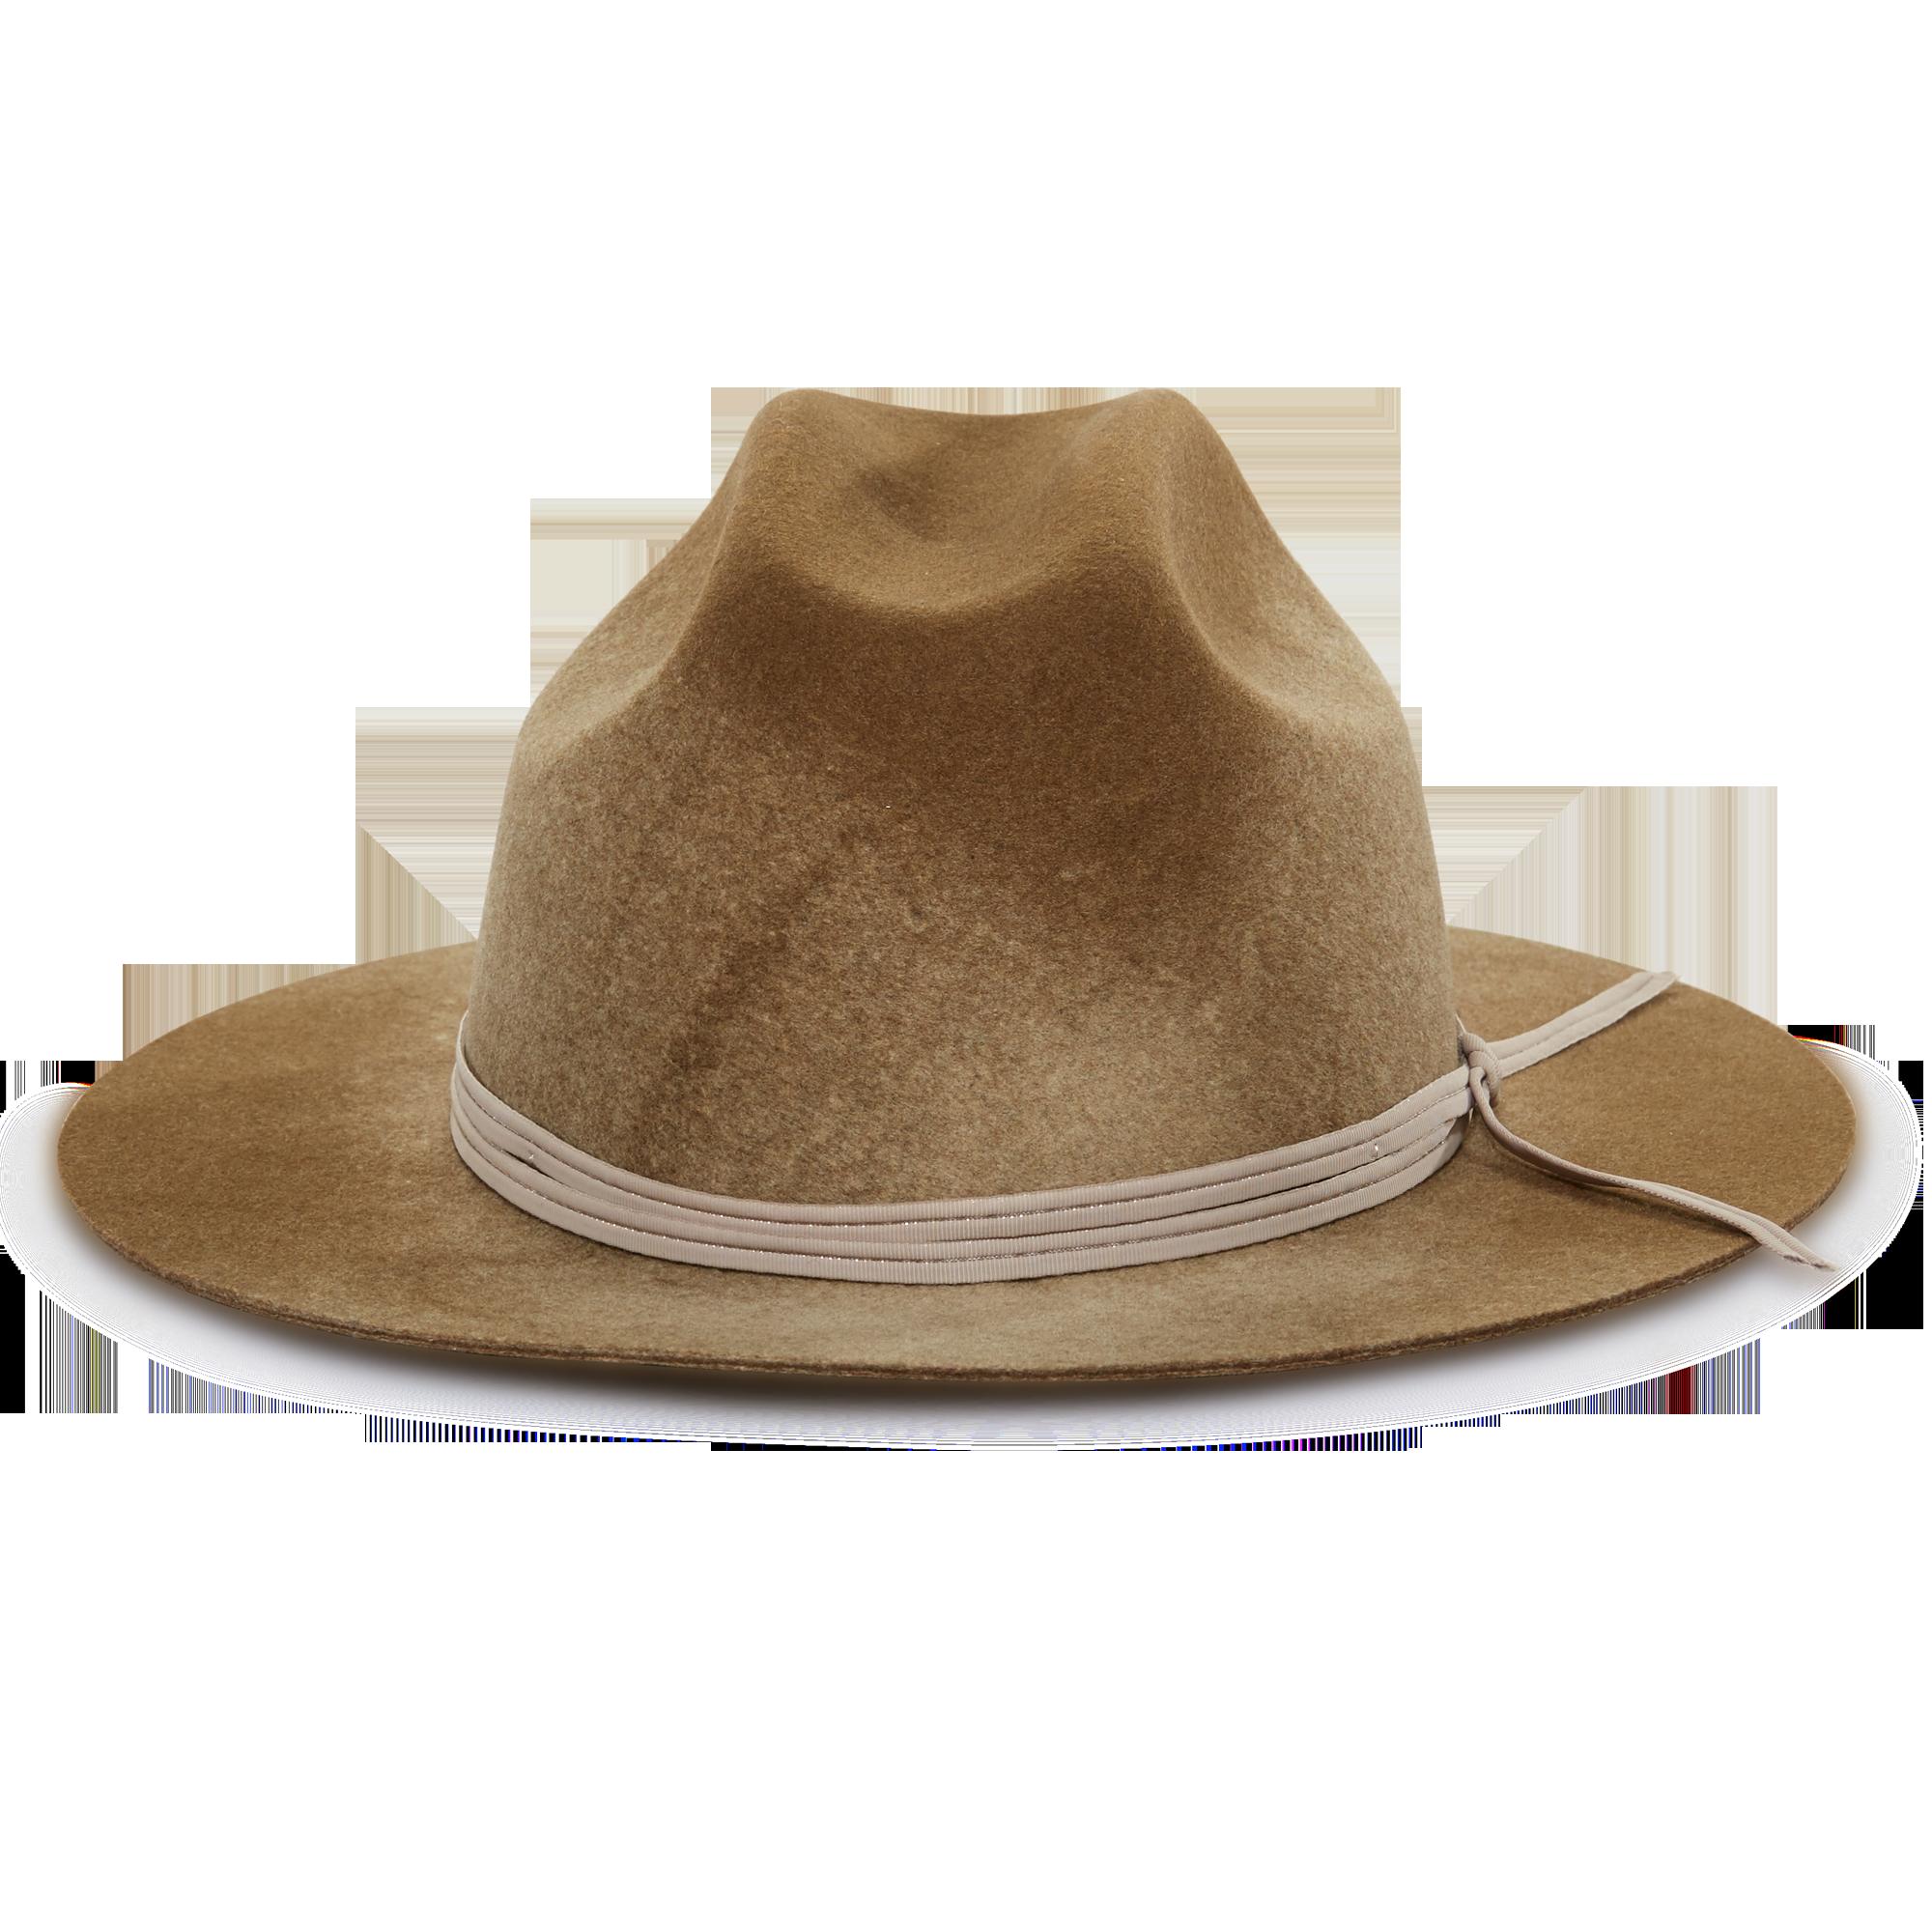 Texas Hold Em Tan Wide Brim Fedora Hat Front View Boinas Gorras Sombreros